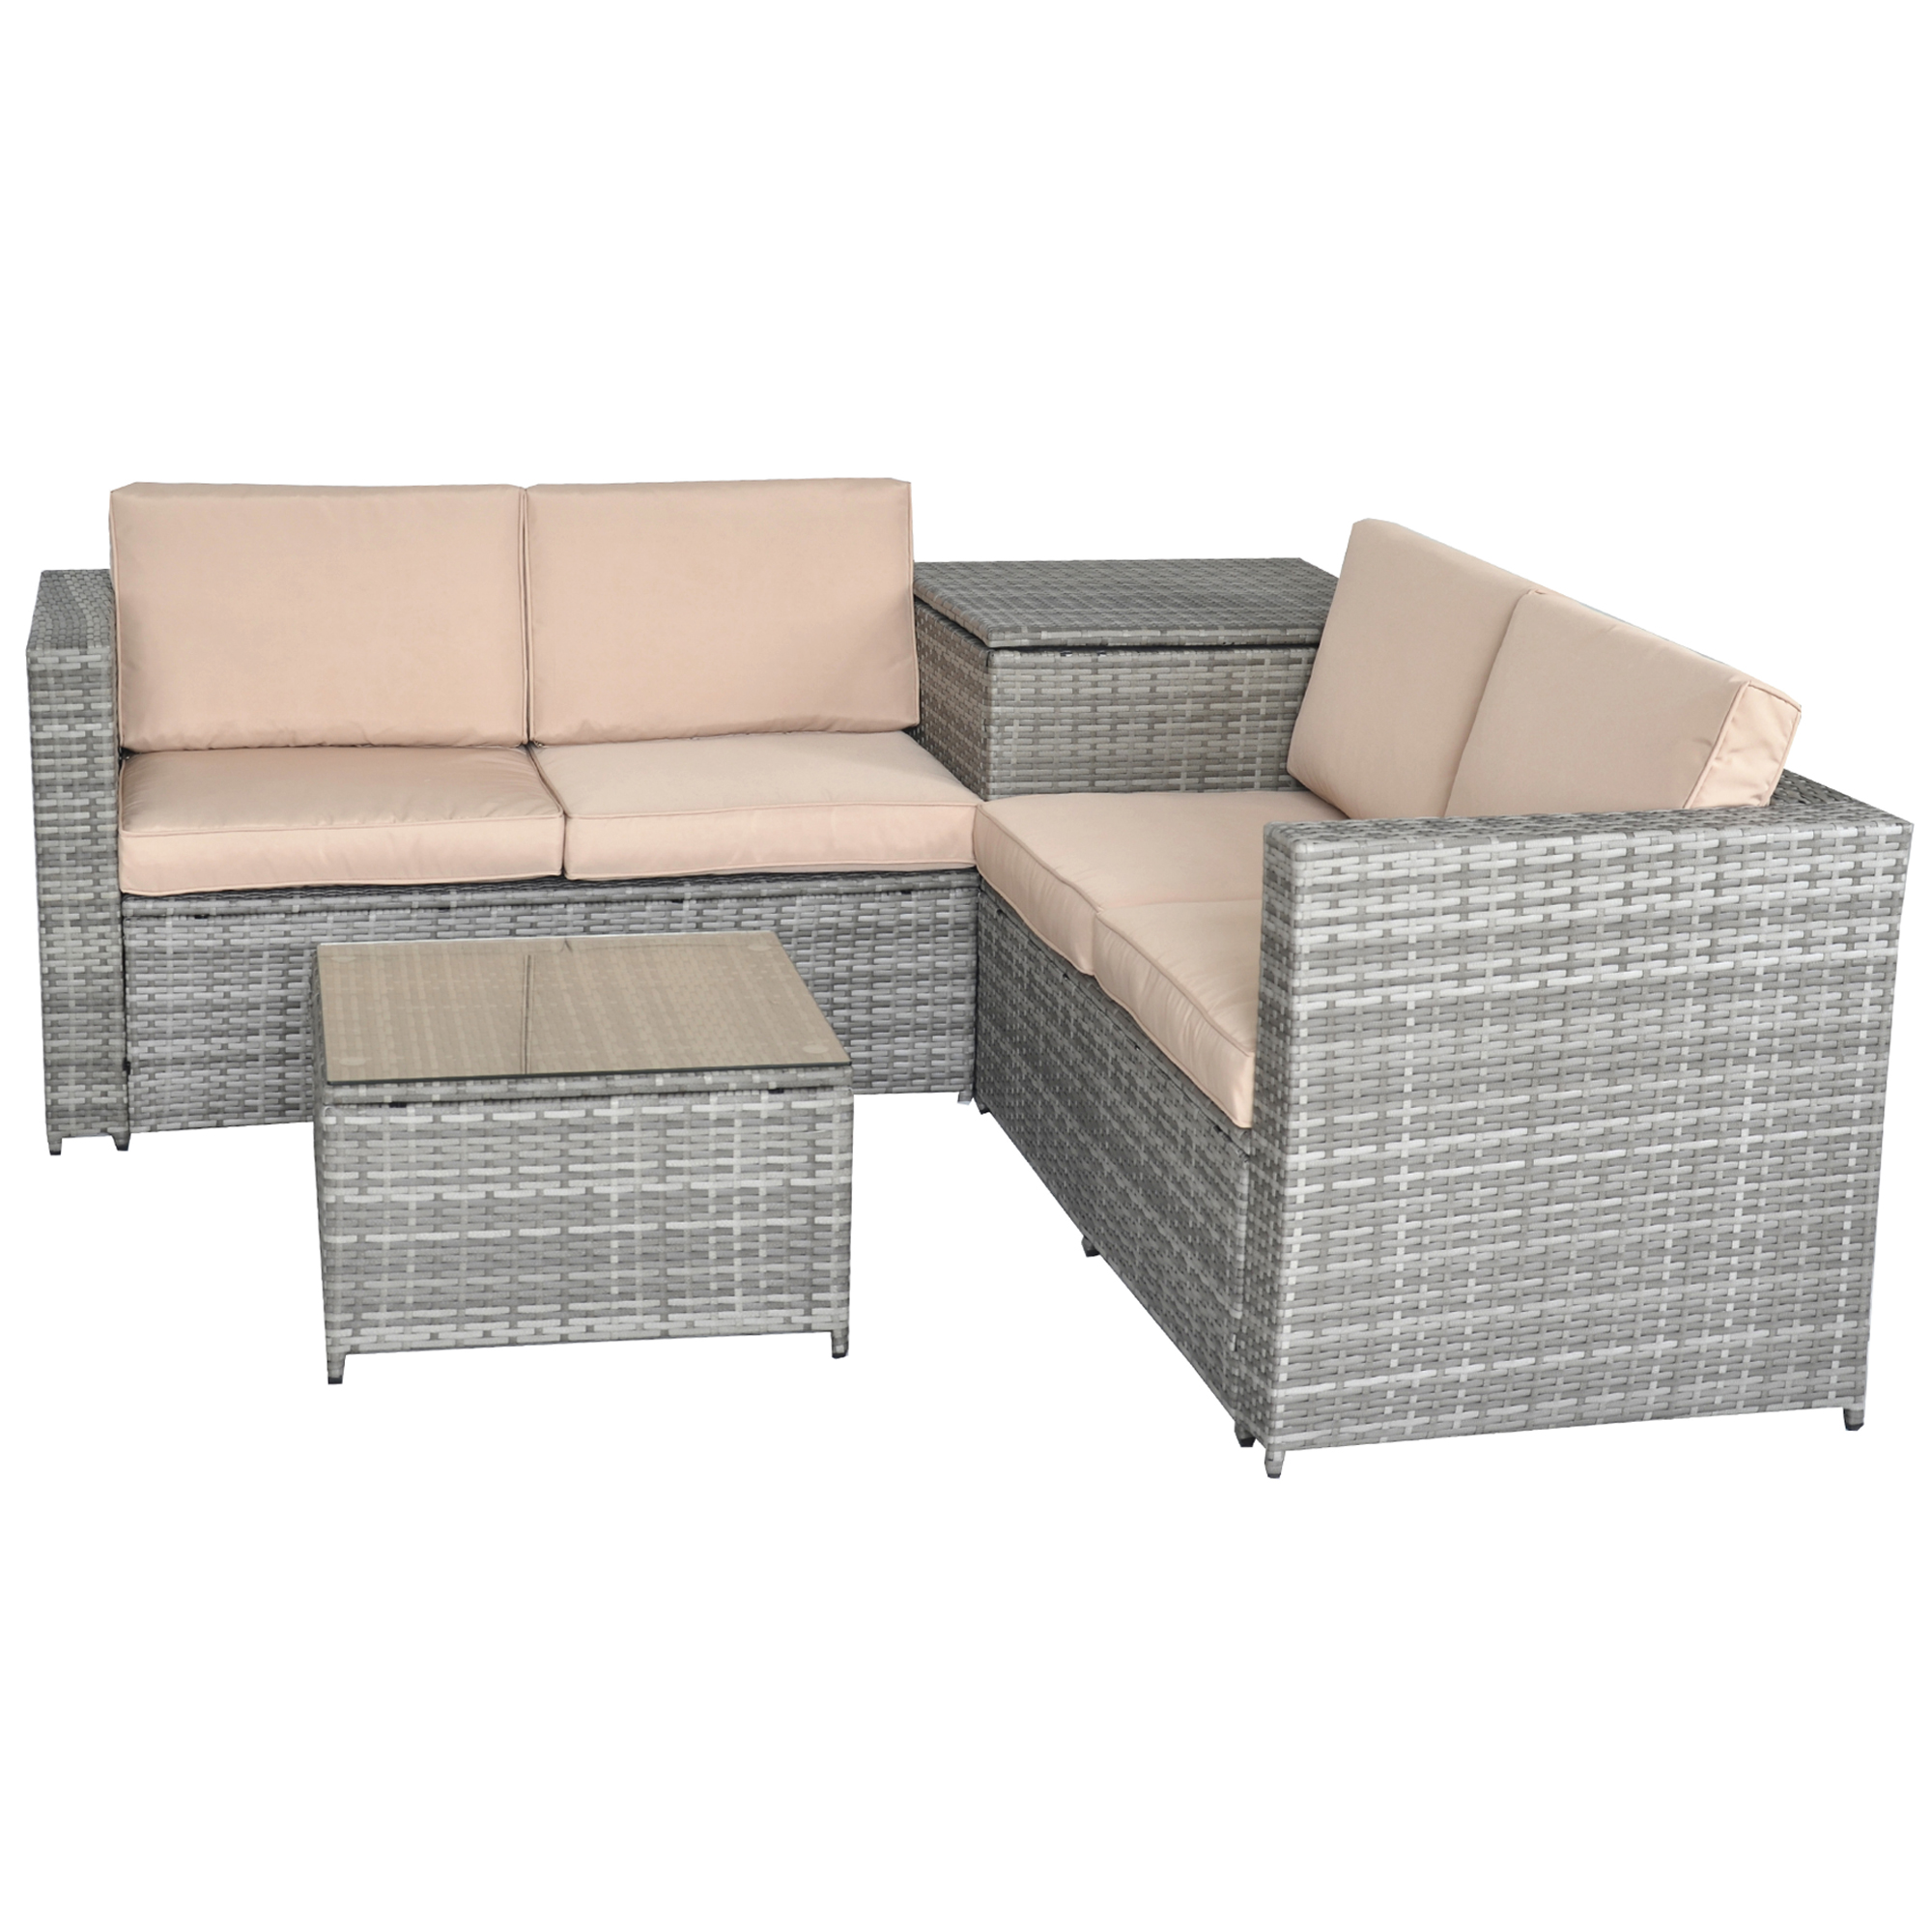 Jalano poly rattan lounge set gartenm bel gartengarnitur 4 for Polyrattan lounge gartenmobel